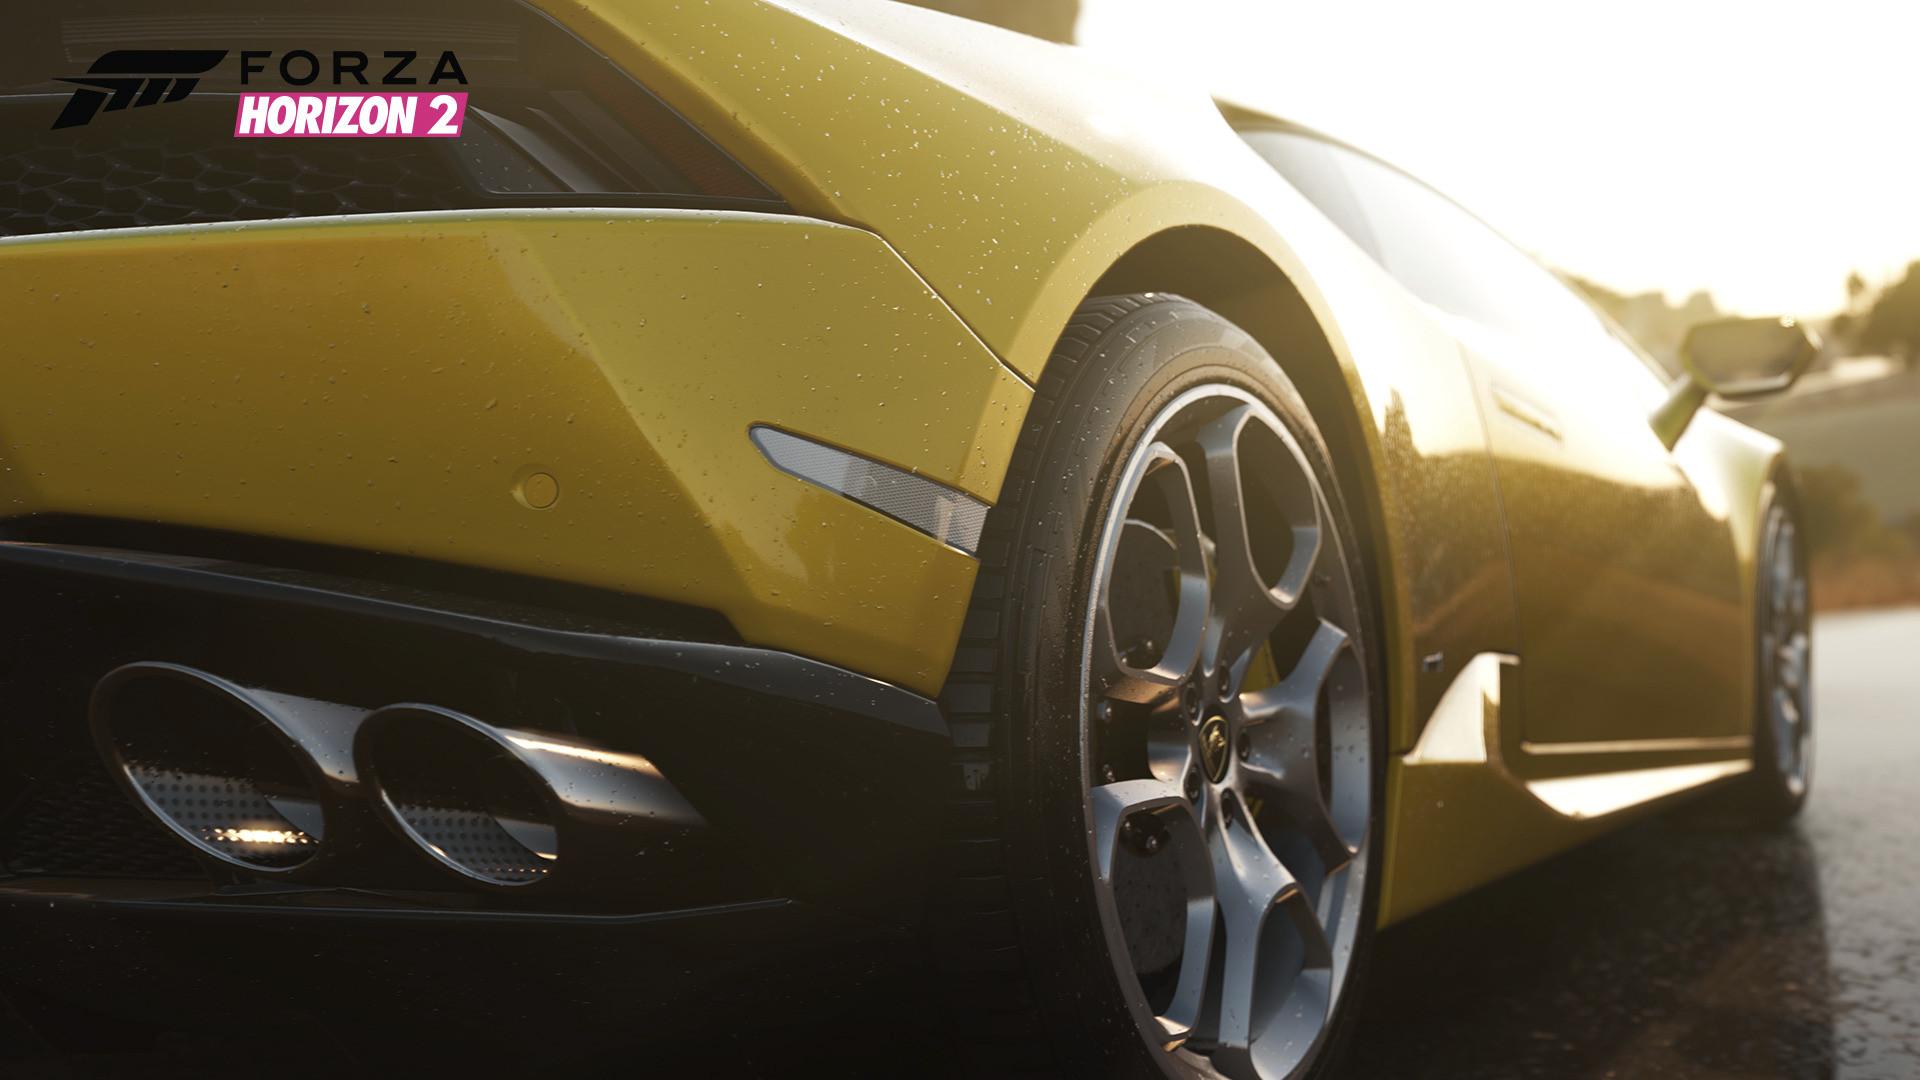 Forza Horizon 2 Xbox One 1 ForzaMotorsport.fr